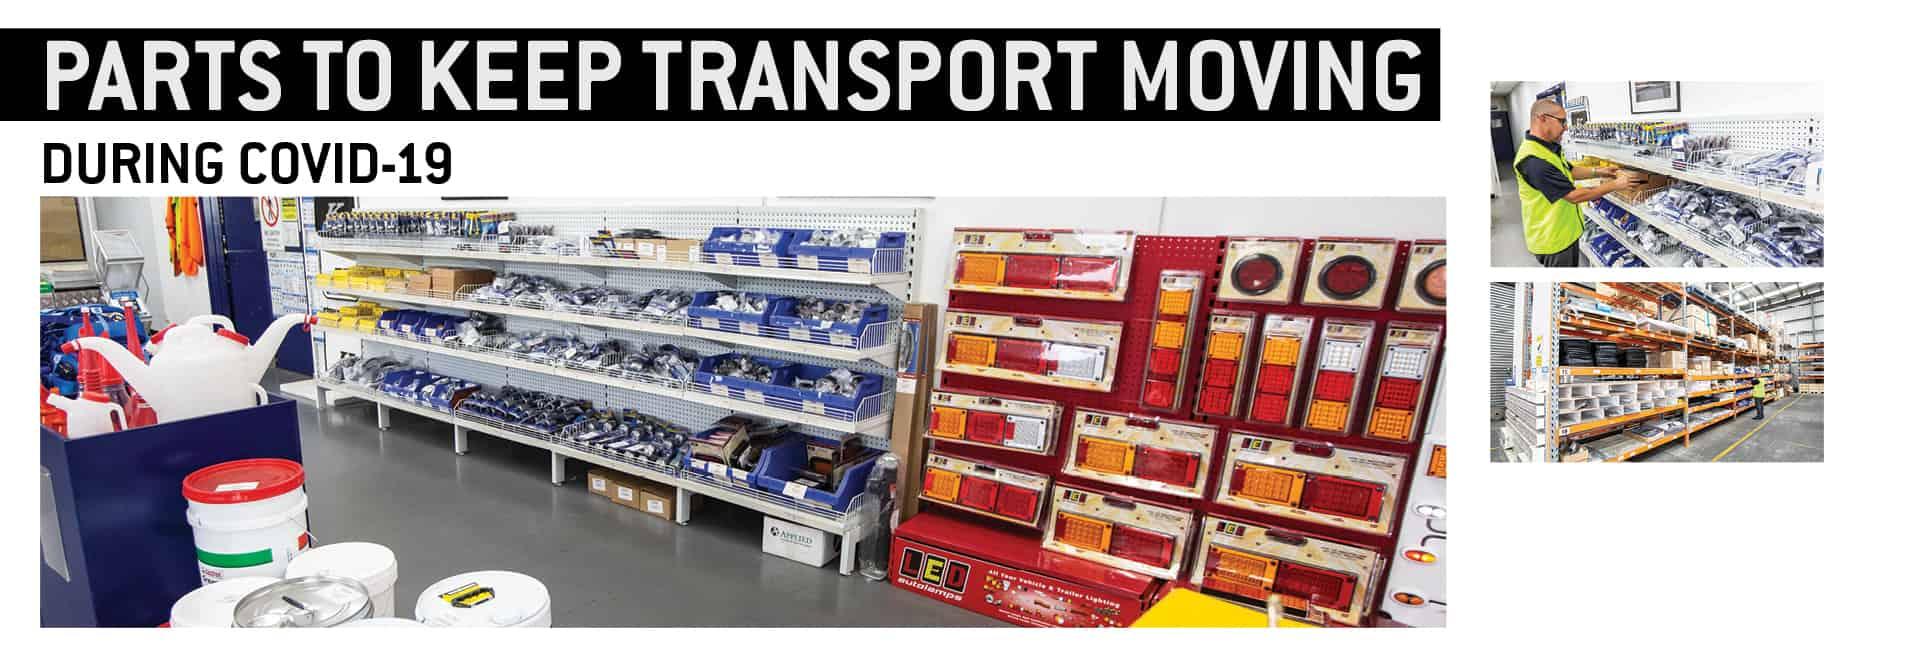 Krueger transport spare parts store